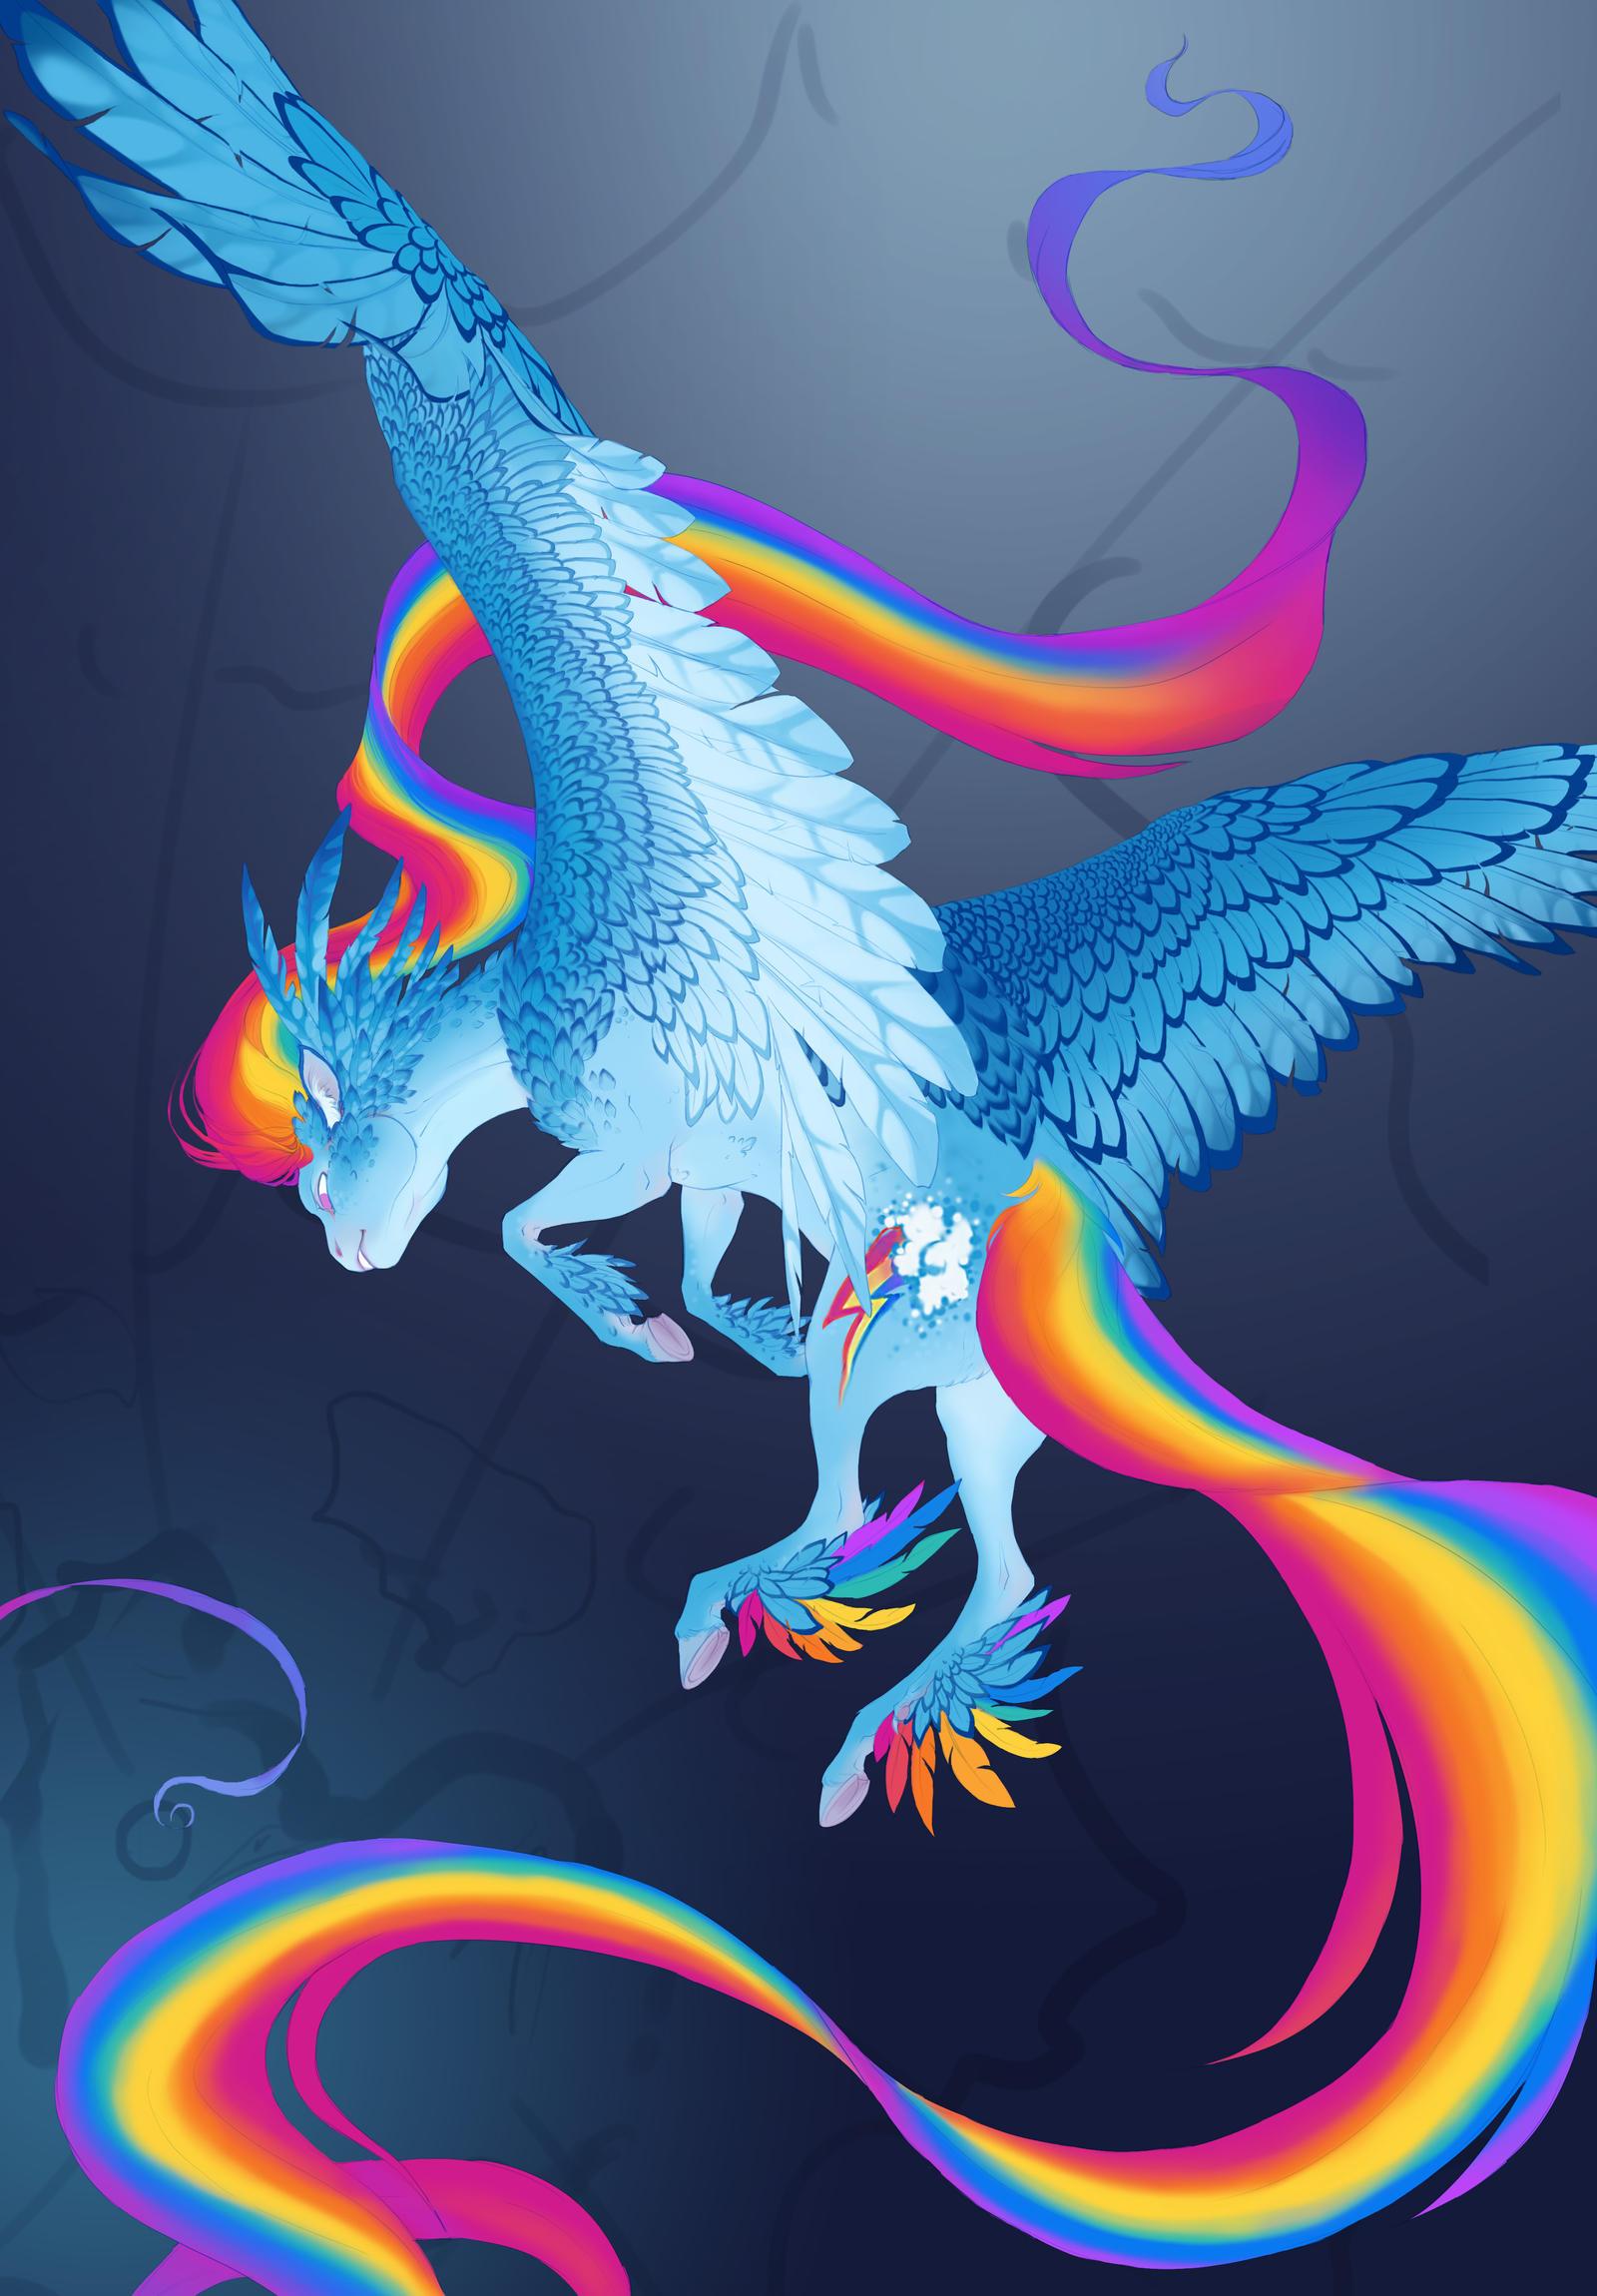 Extra Rainbow Rainbow Dash WIP by turnipBerry